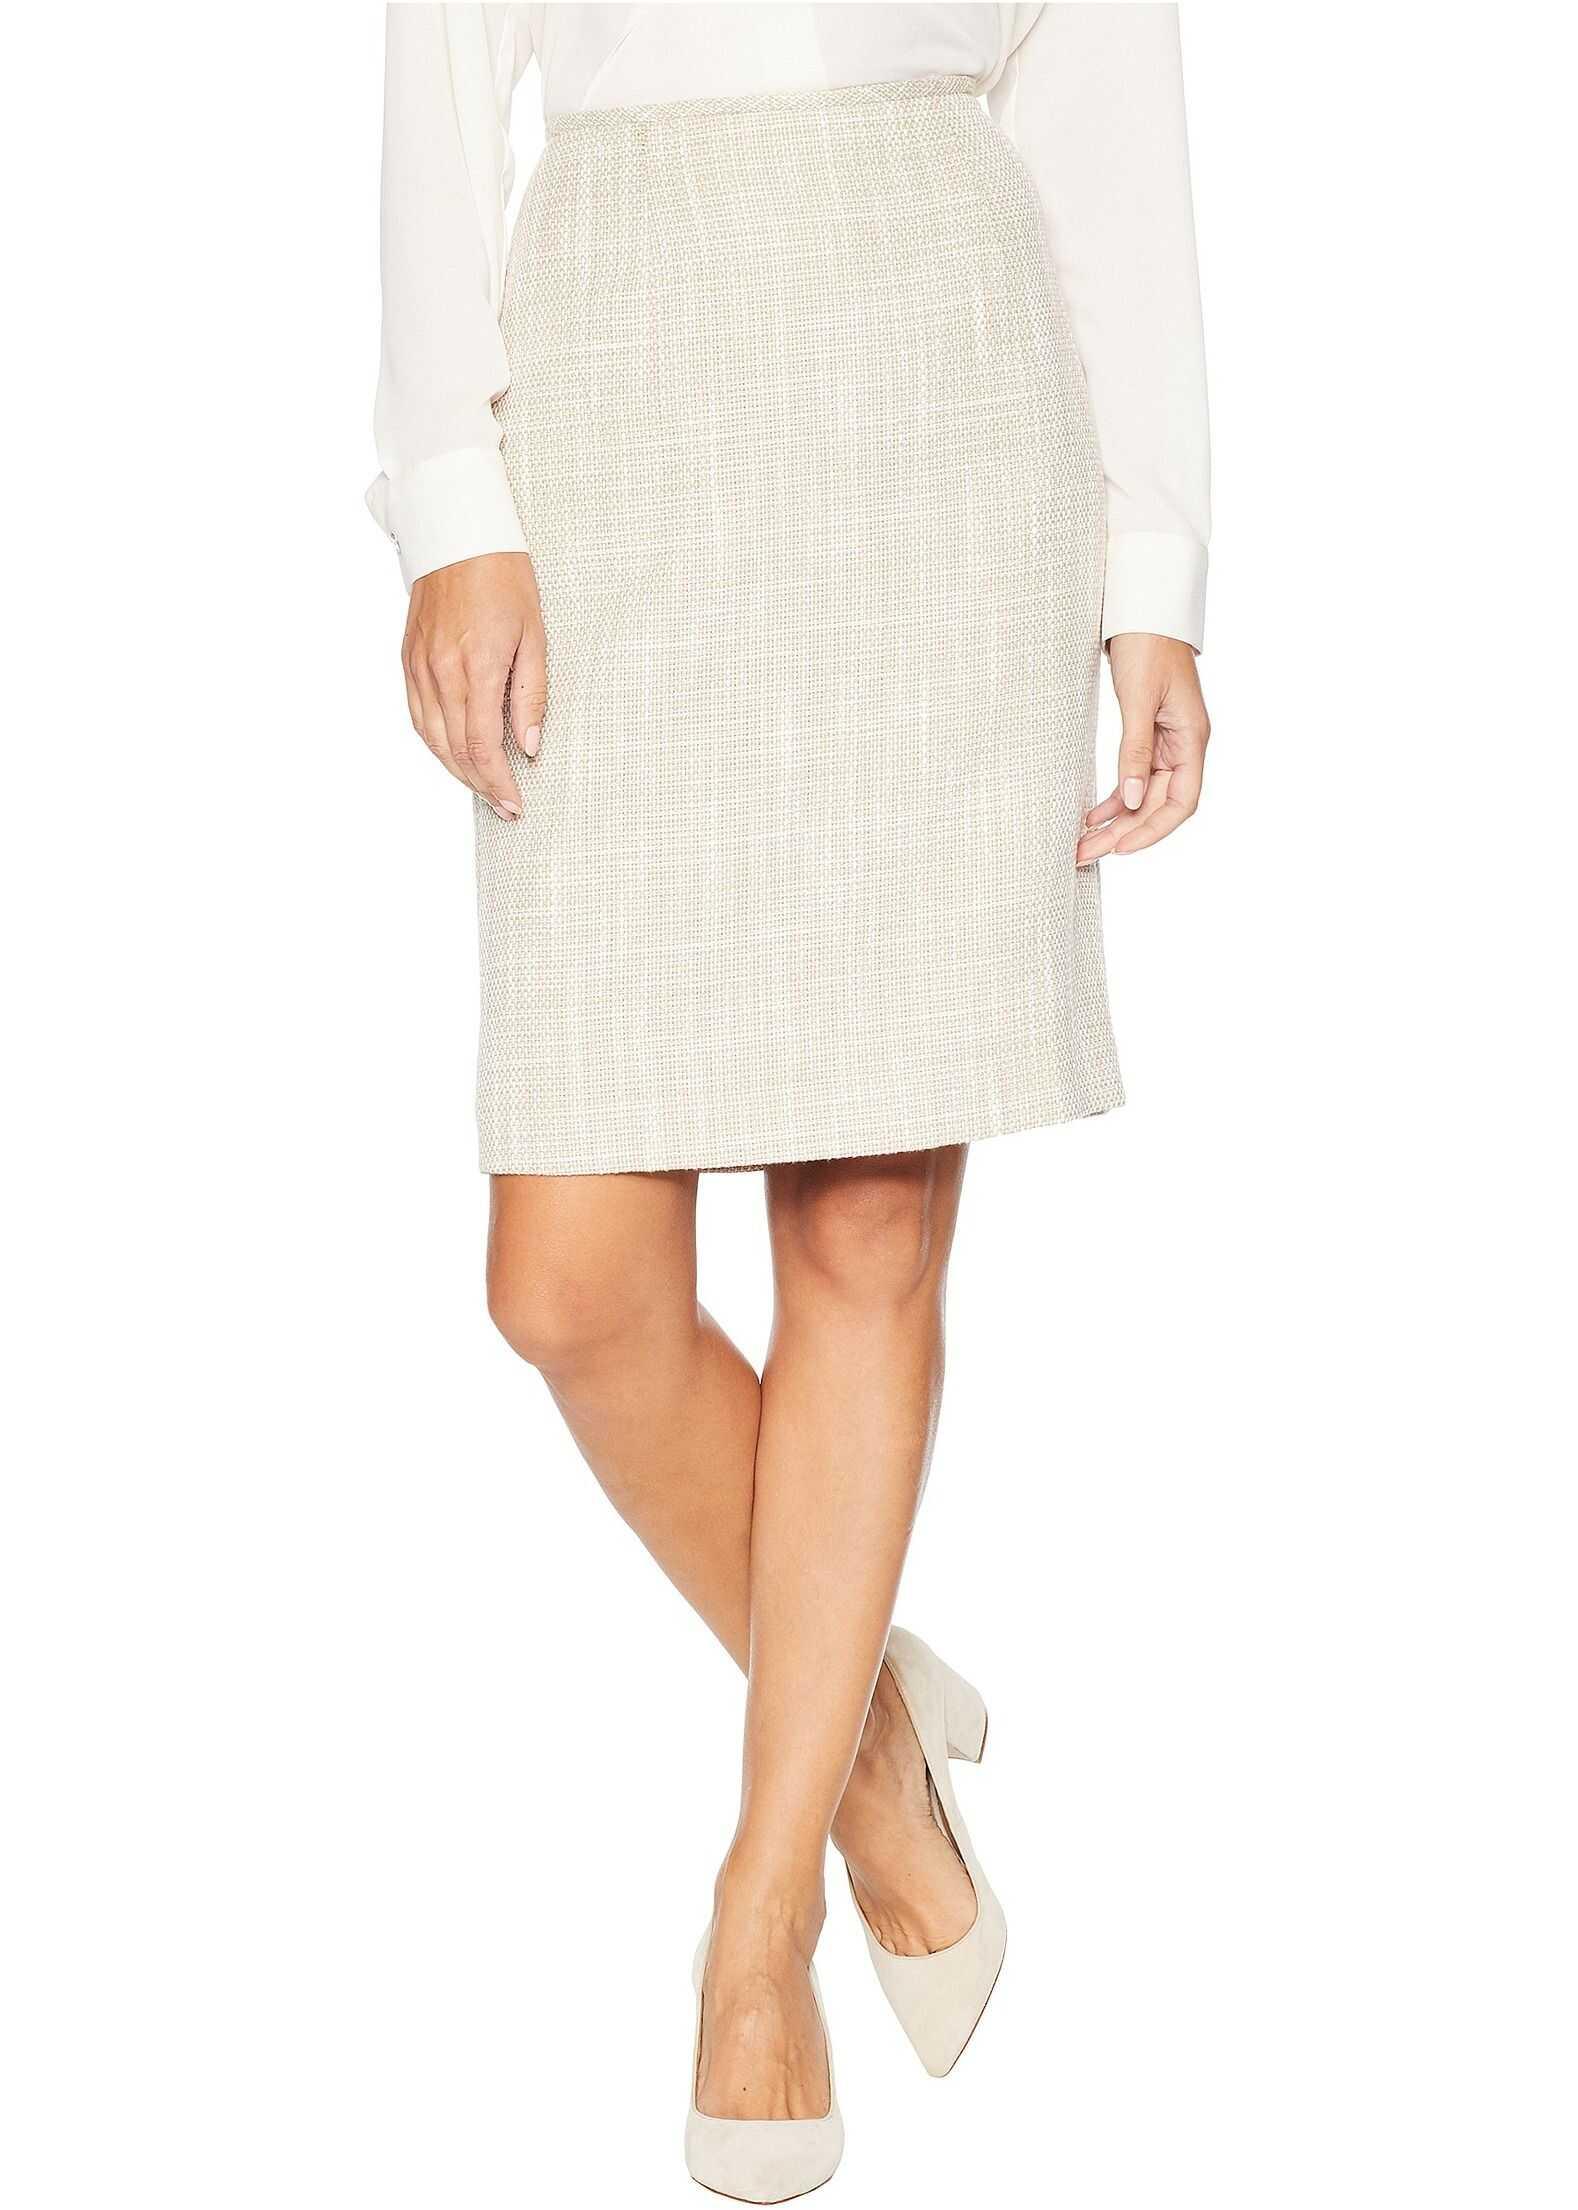 Calvin Klein Woven Skirt Khaki/Cream